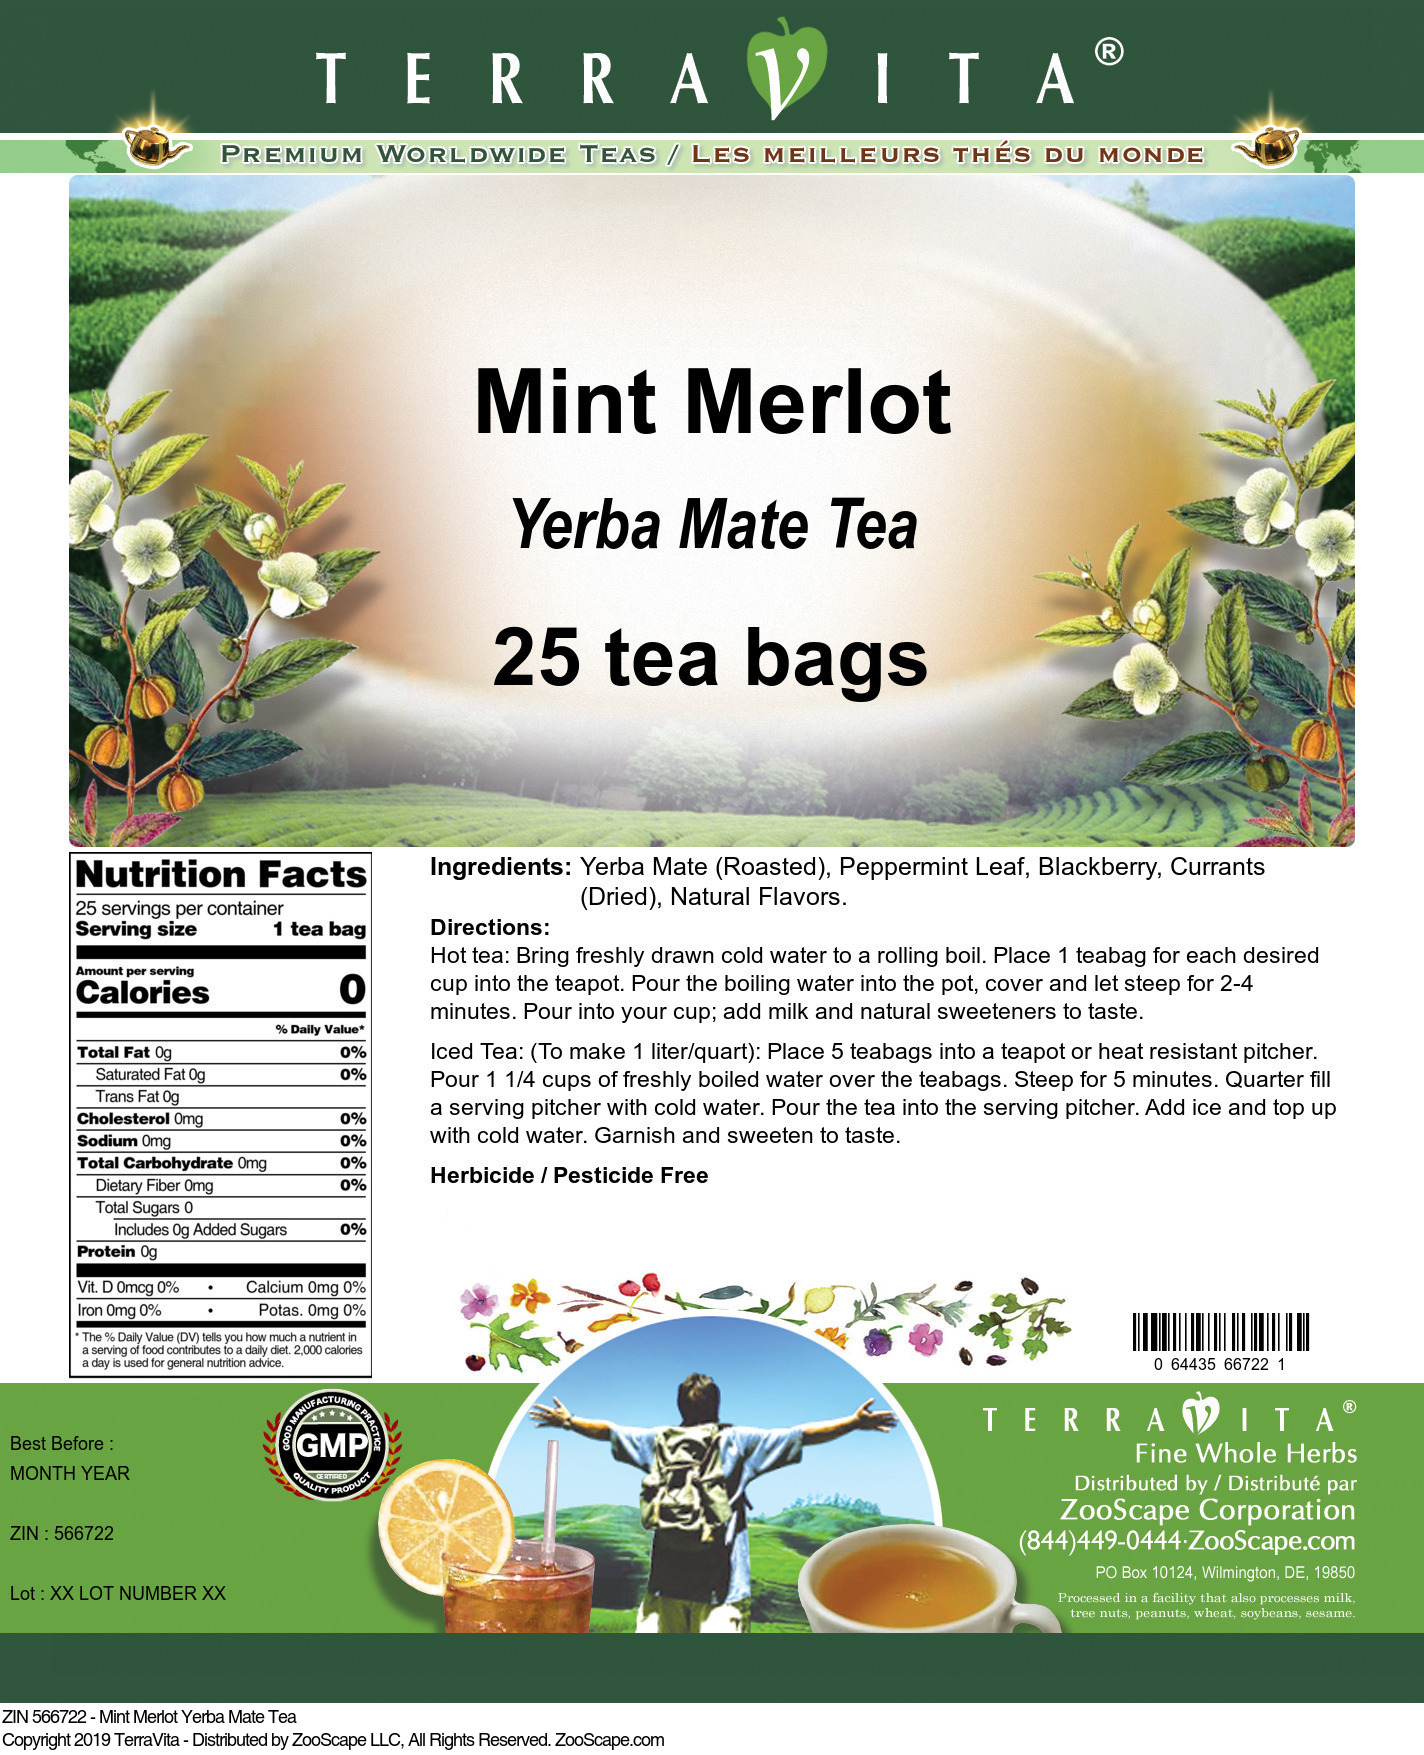 Mint Merlot Yerba Mate